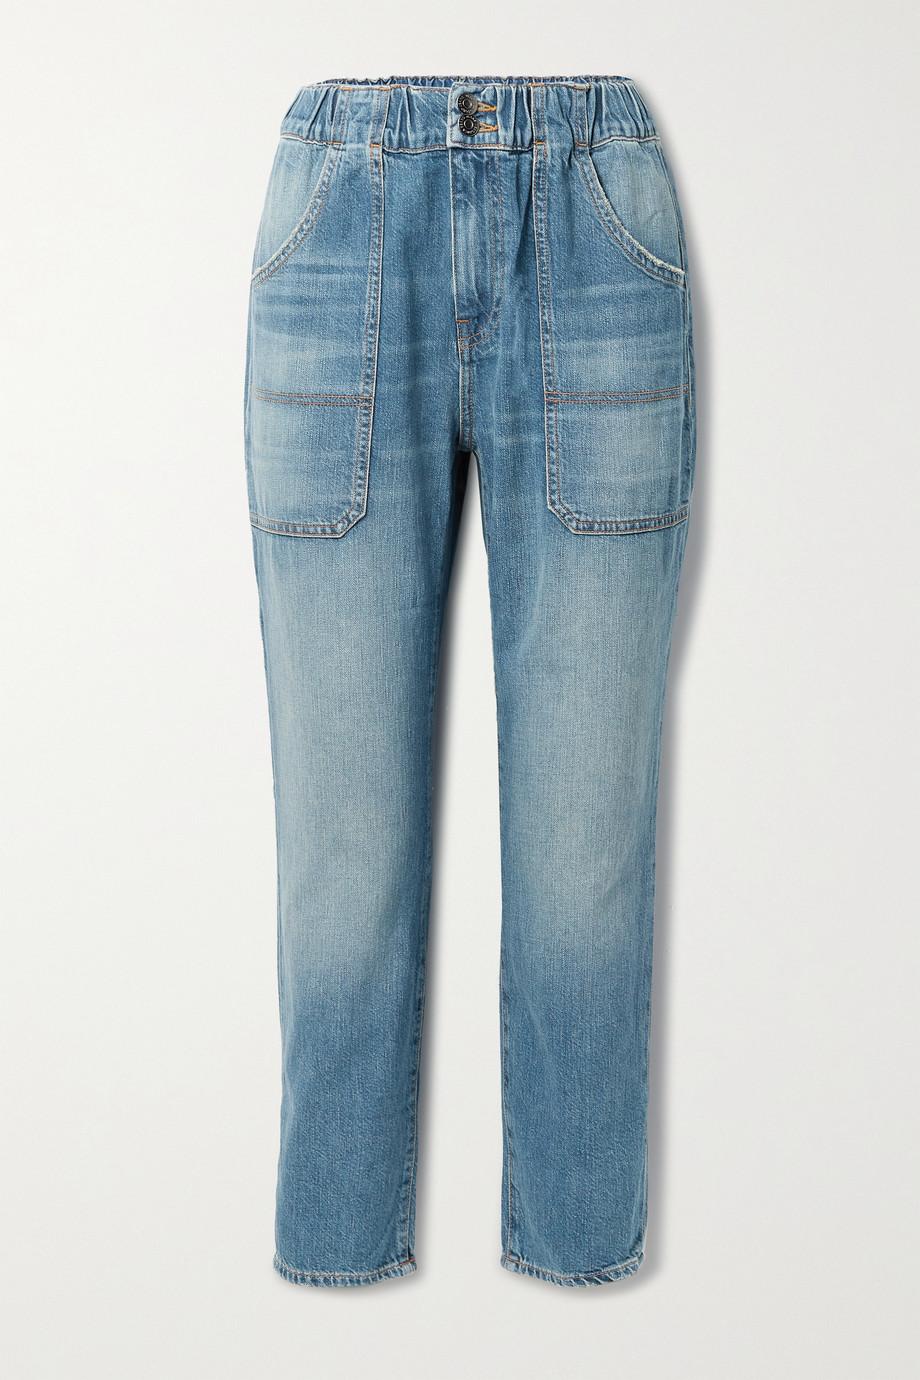 Veronica Beard Arya cropped high-rise straight-leg jeans